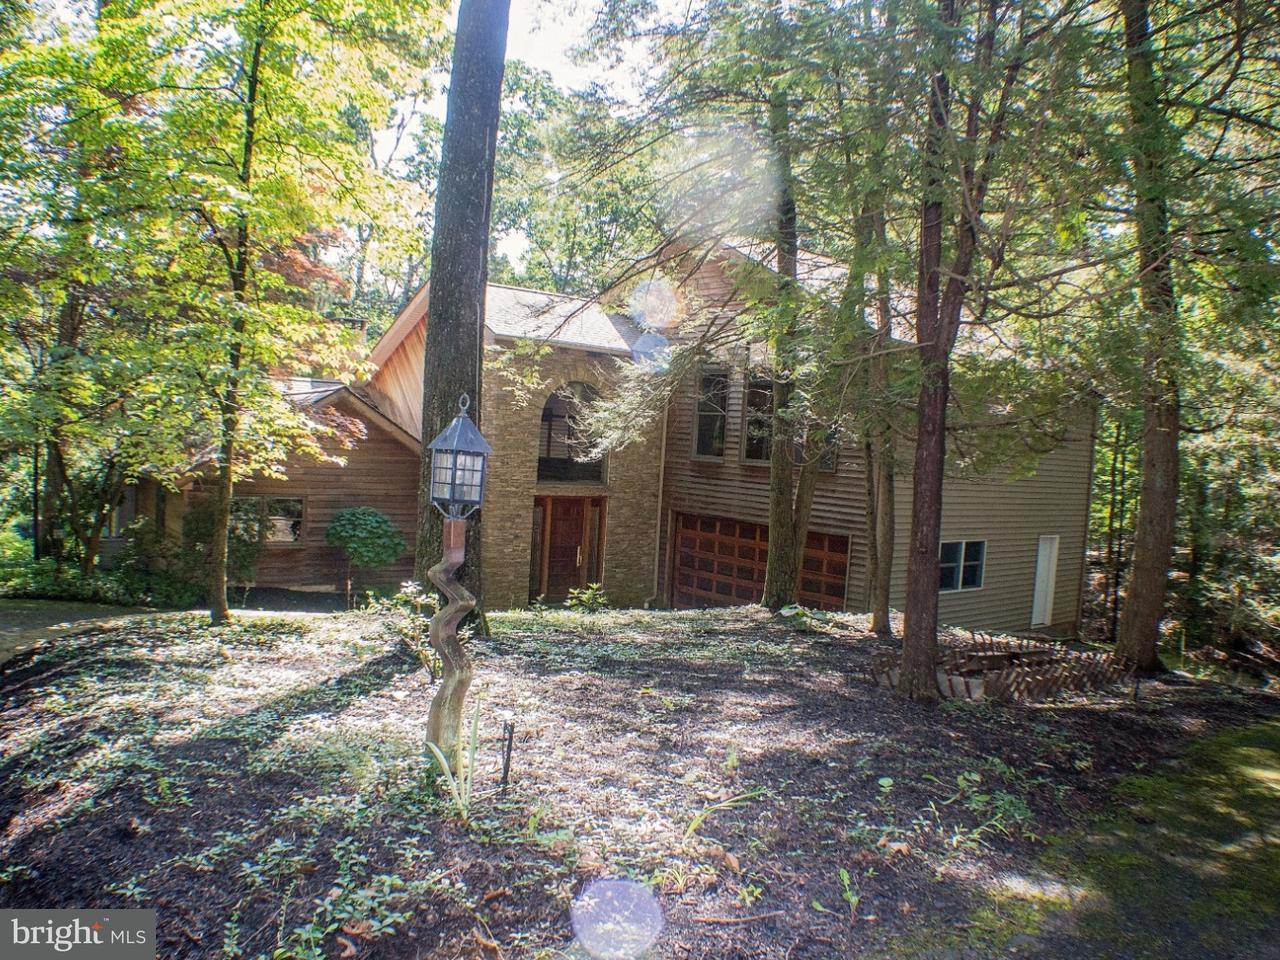 独户住宅 为 销售 在 407 SALFORD STATION Road Perkiomenville, 宾夕法尼亚州 18074 美国